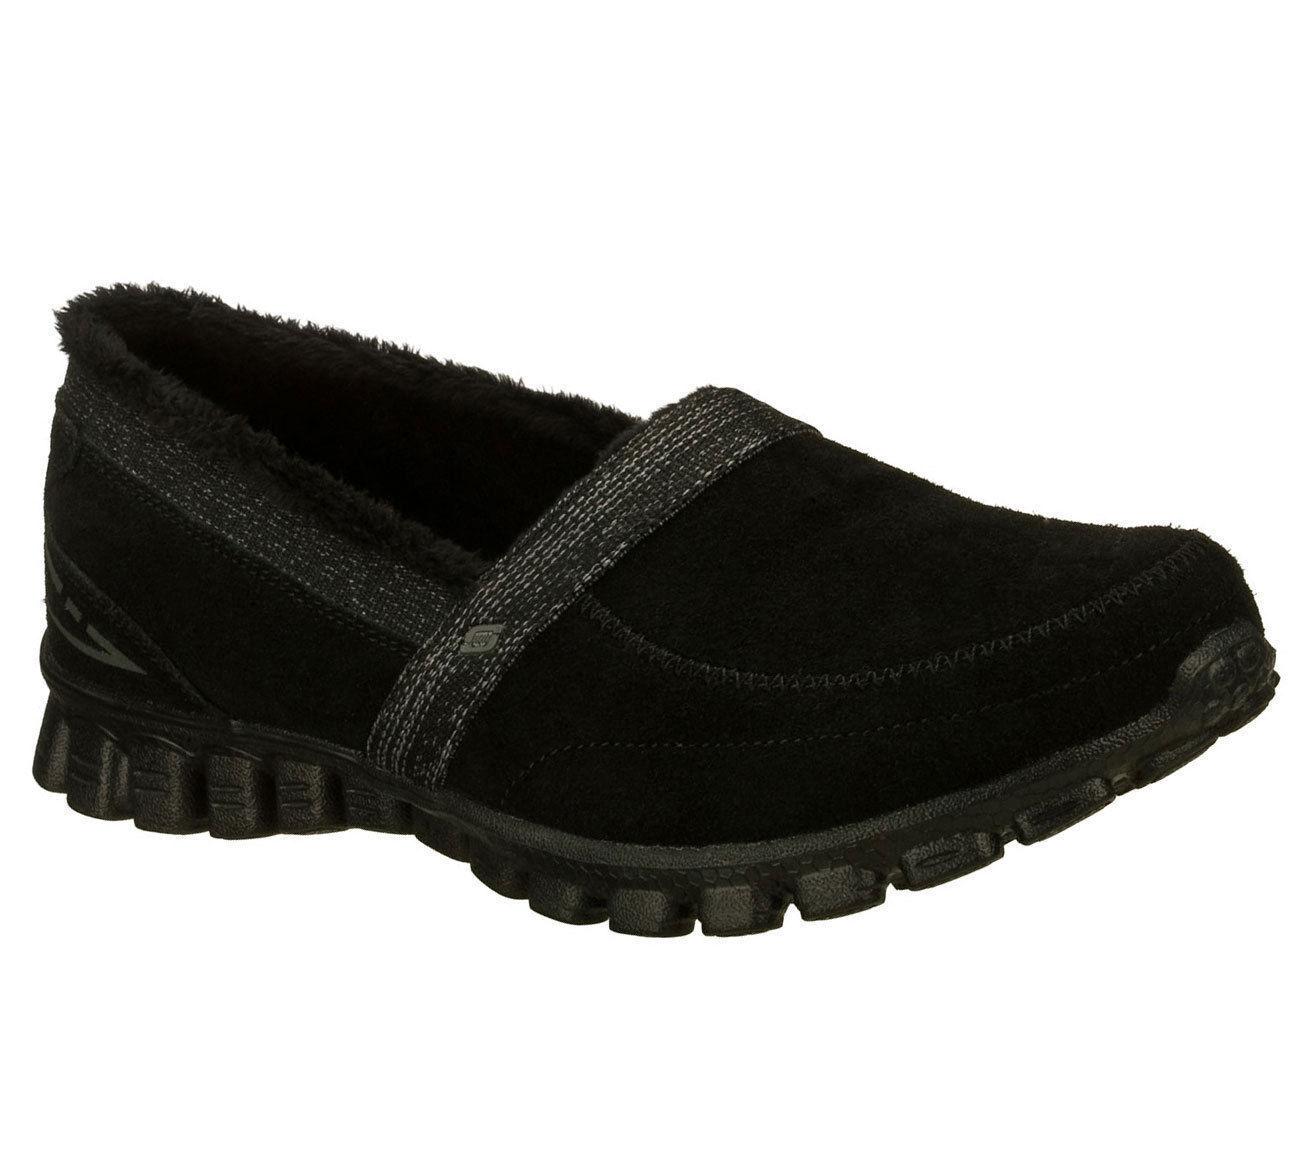 Skechers Shoes for Women for sale | eBay